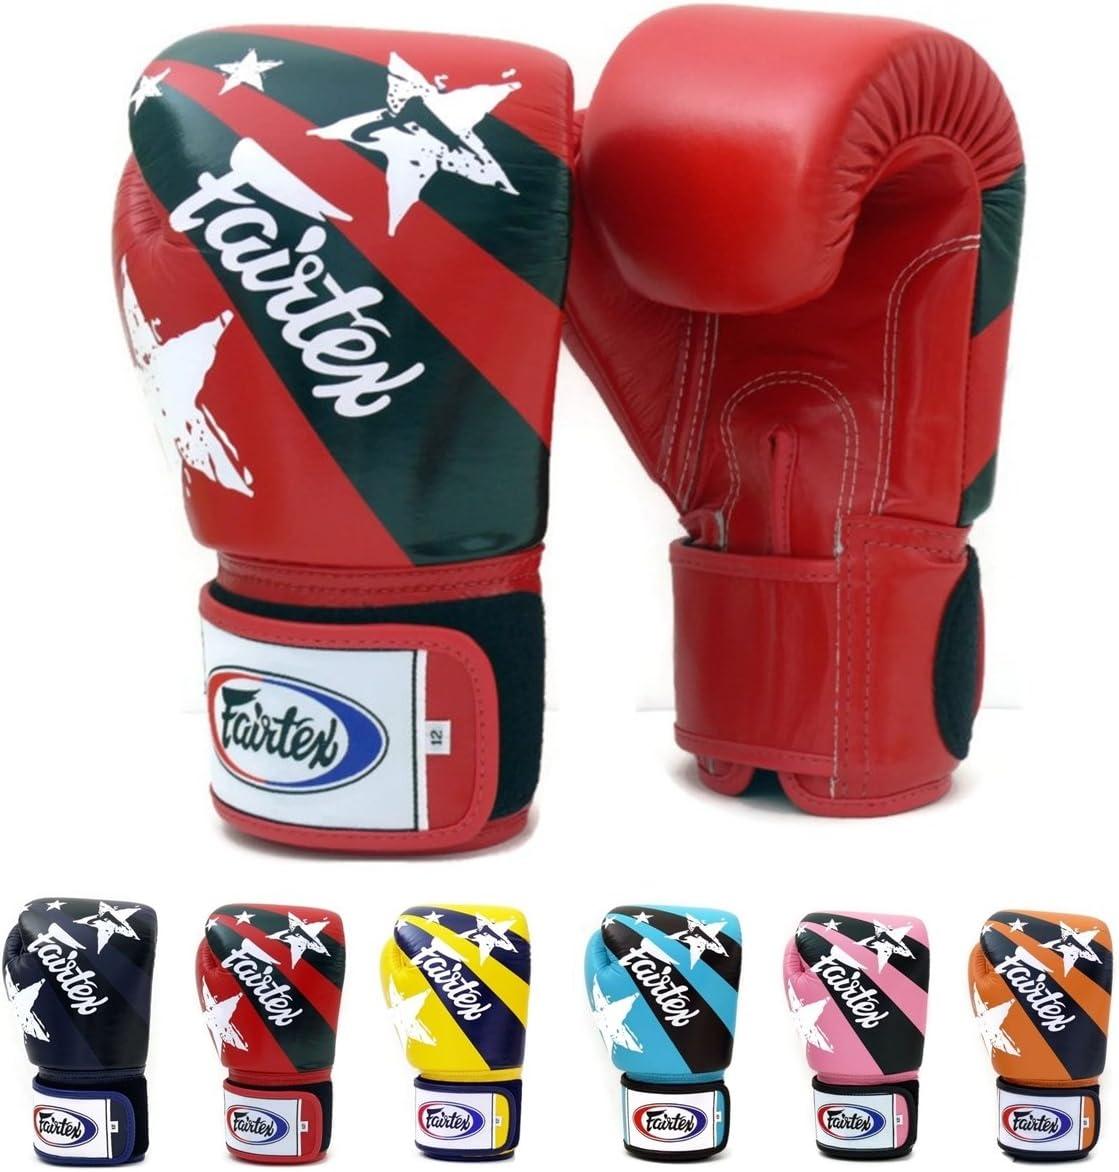 (300ml, 赤 Nation Print) - Fairtex Muay Thai Boxing Gloves BGV1 Colour: 黒 青 白い 赤 Classic 褐色 Emerald Falcon ピンク 黄 オレンジ Thai Pride USA Flag Size: 10 12 14 470ml Training & Sparring All Purpose Gloves for Kick Boxing MMA K1 Tight Fit